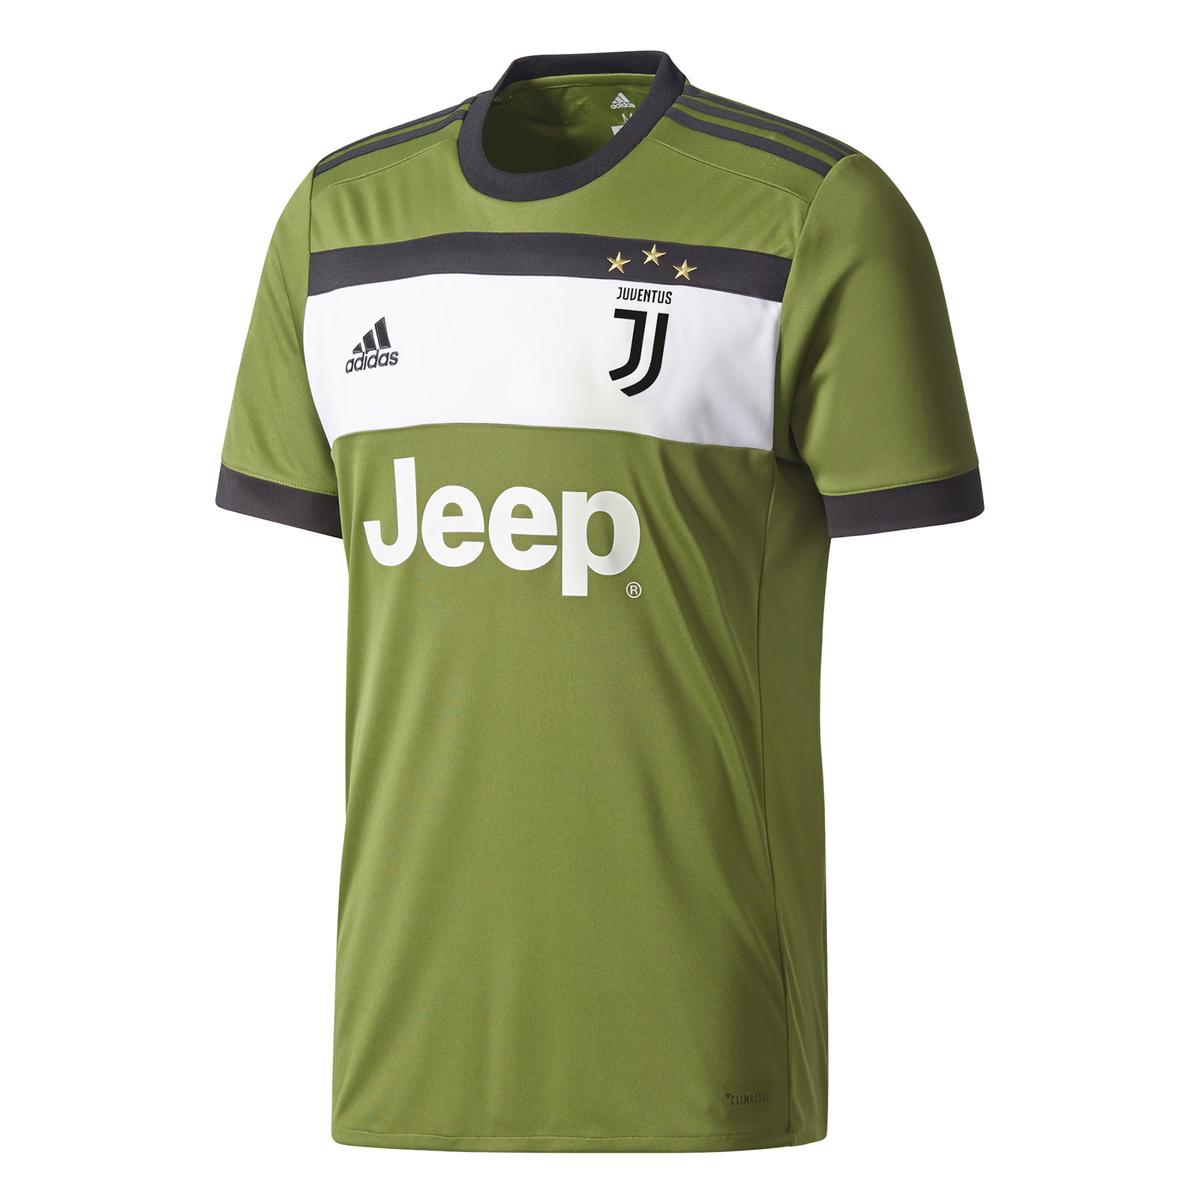 Terza maglia Juventus 2017/2018